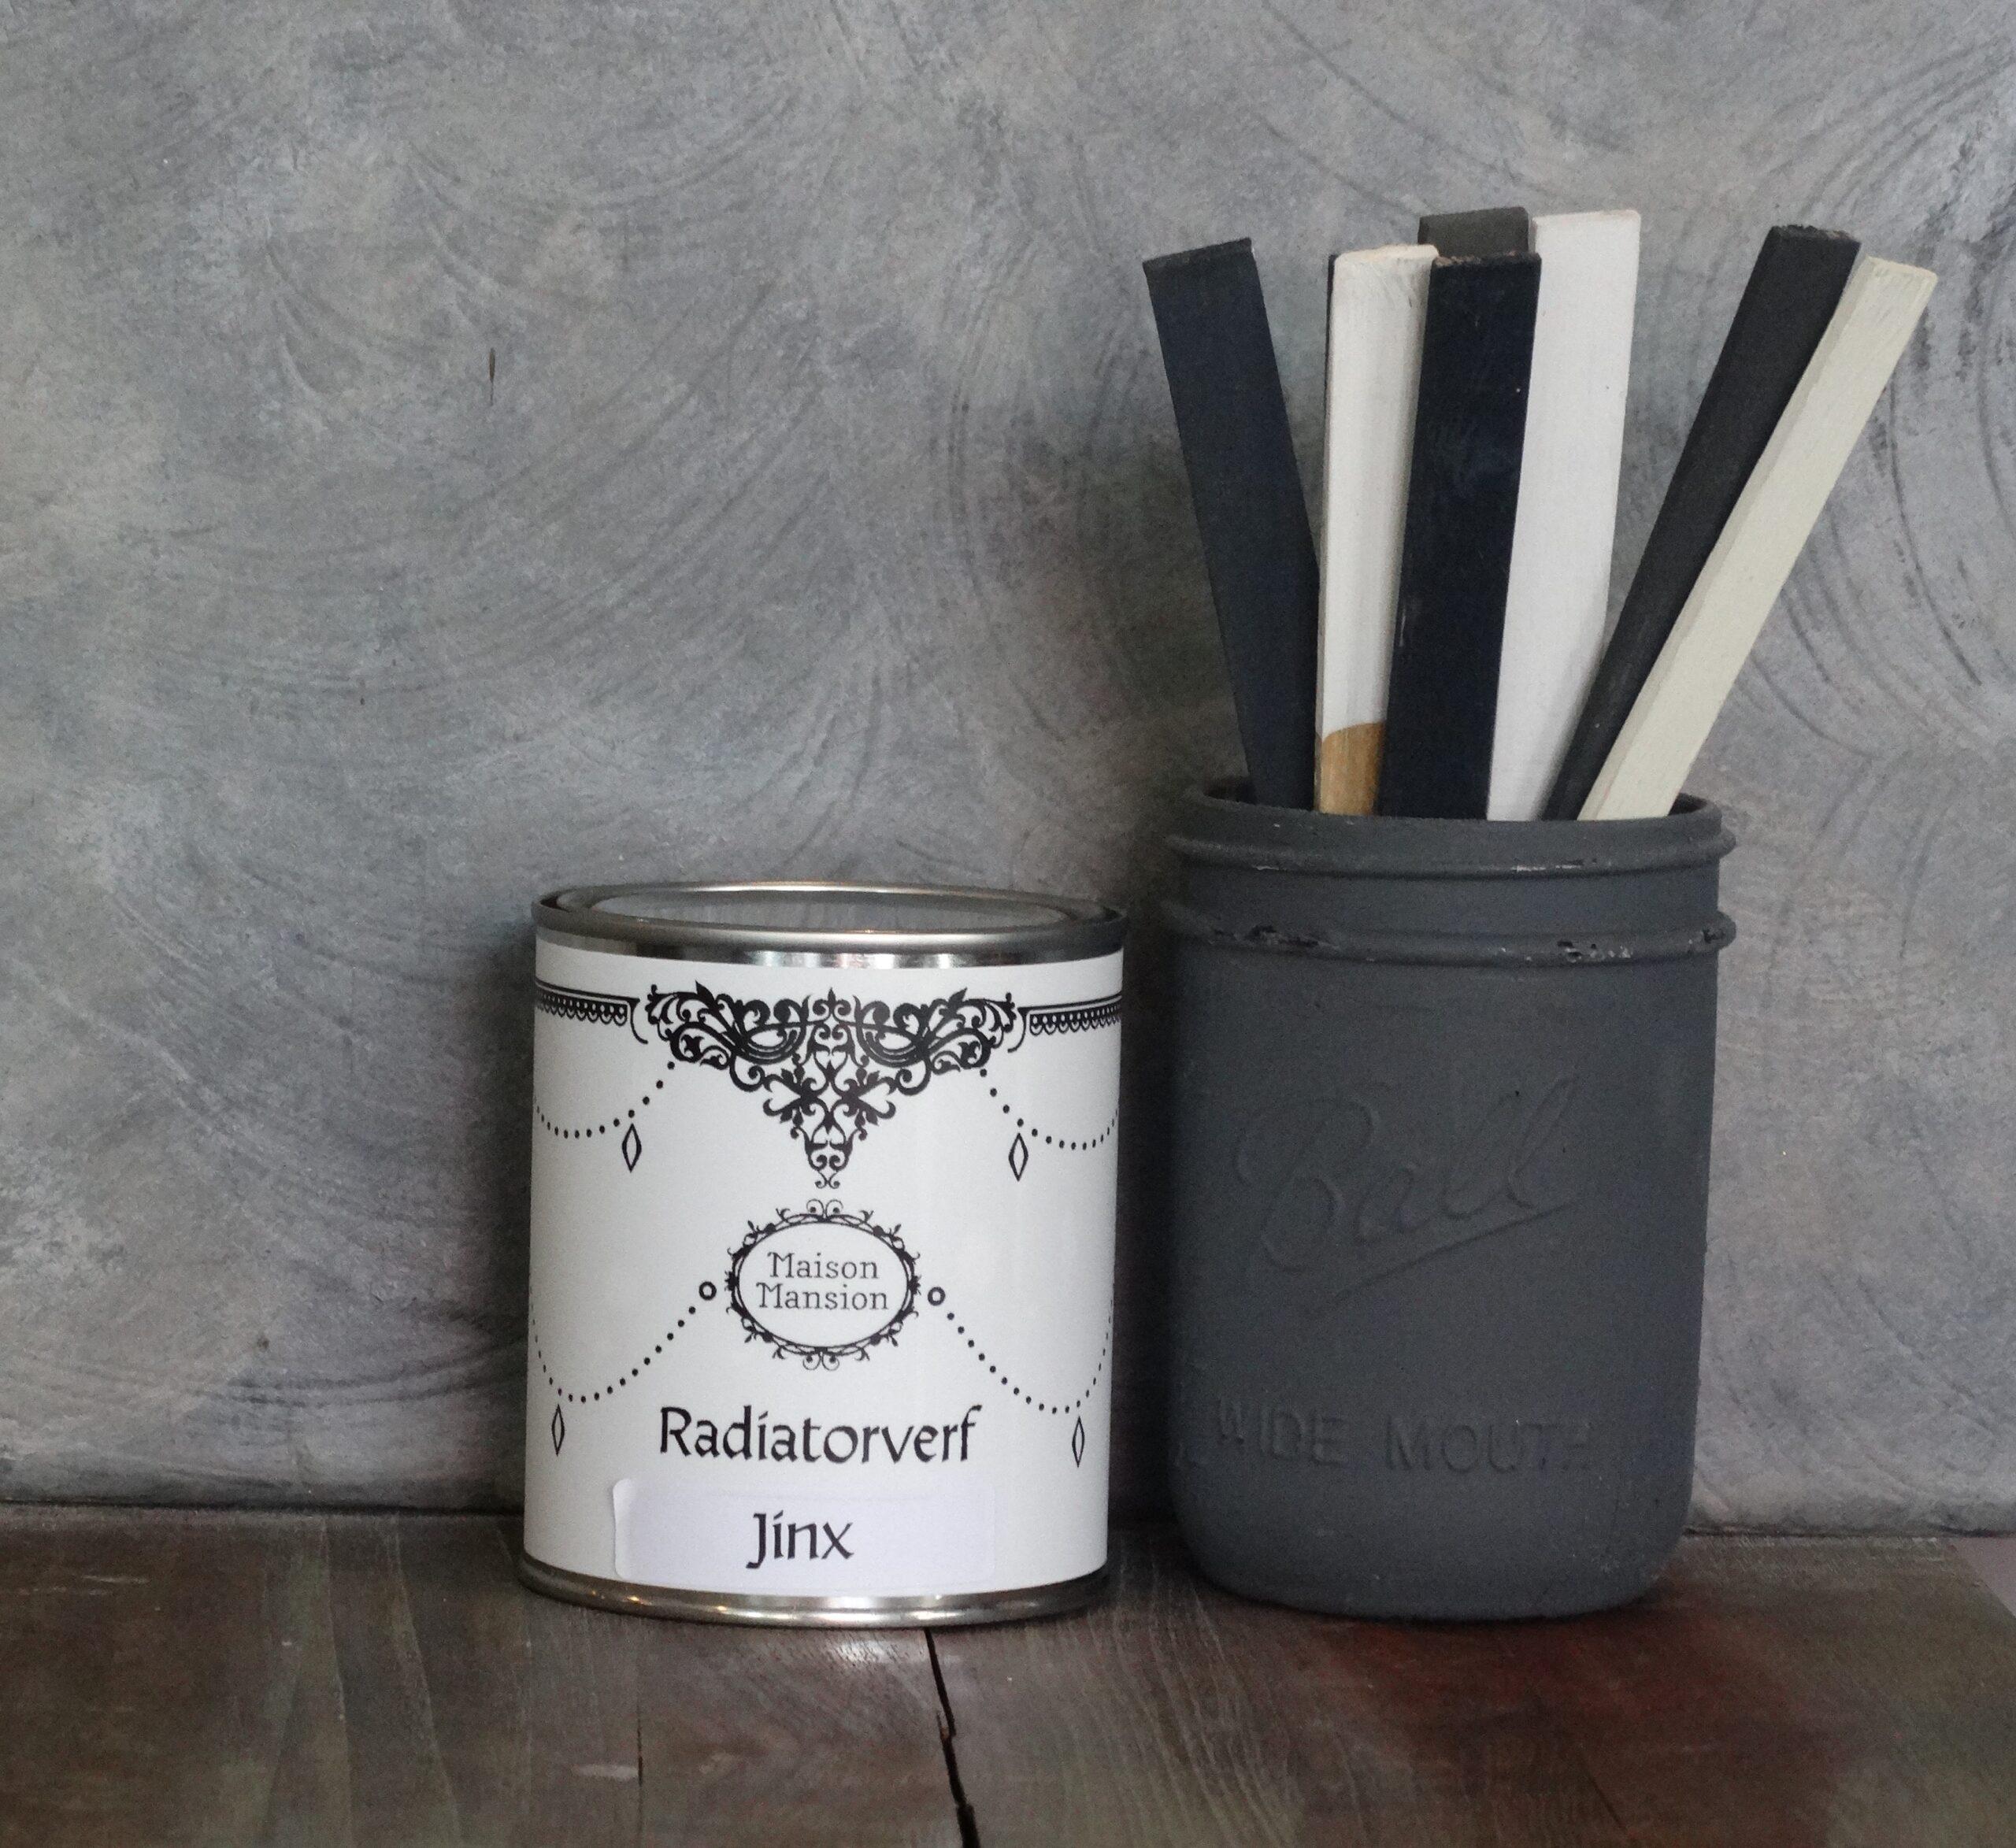 Radiatorverf MaisonMansion